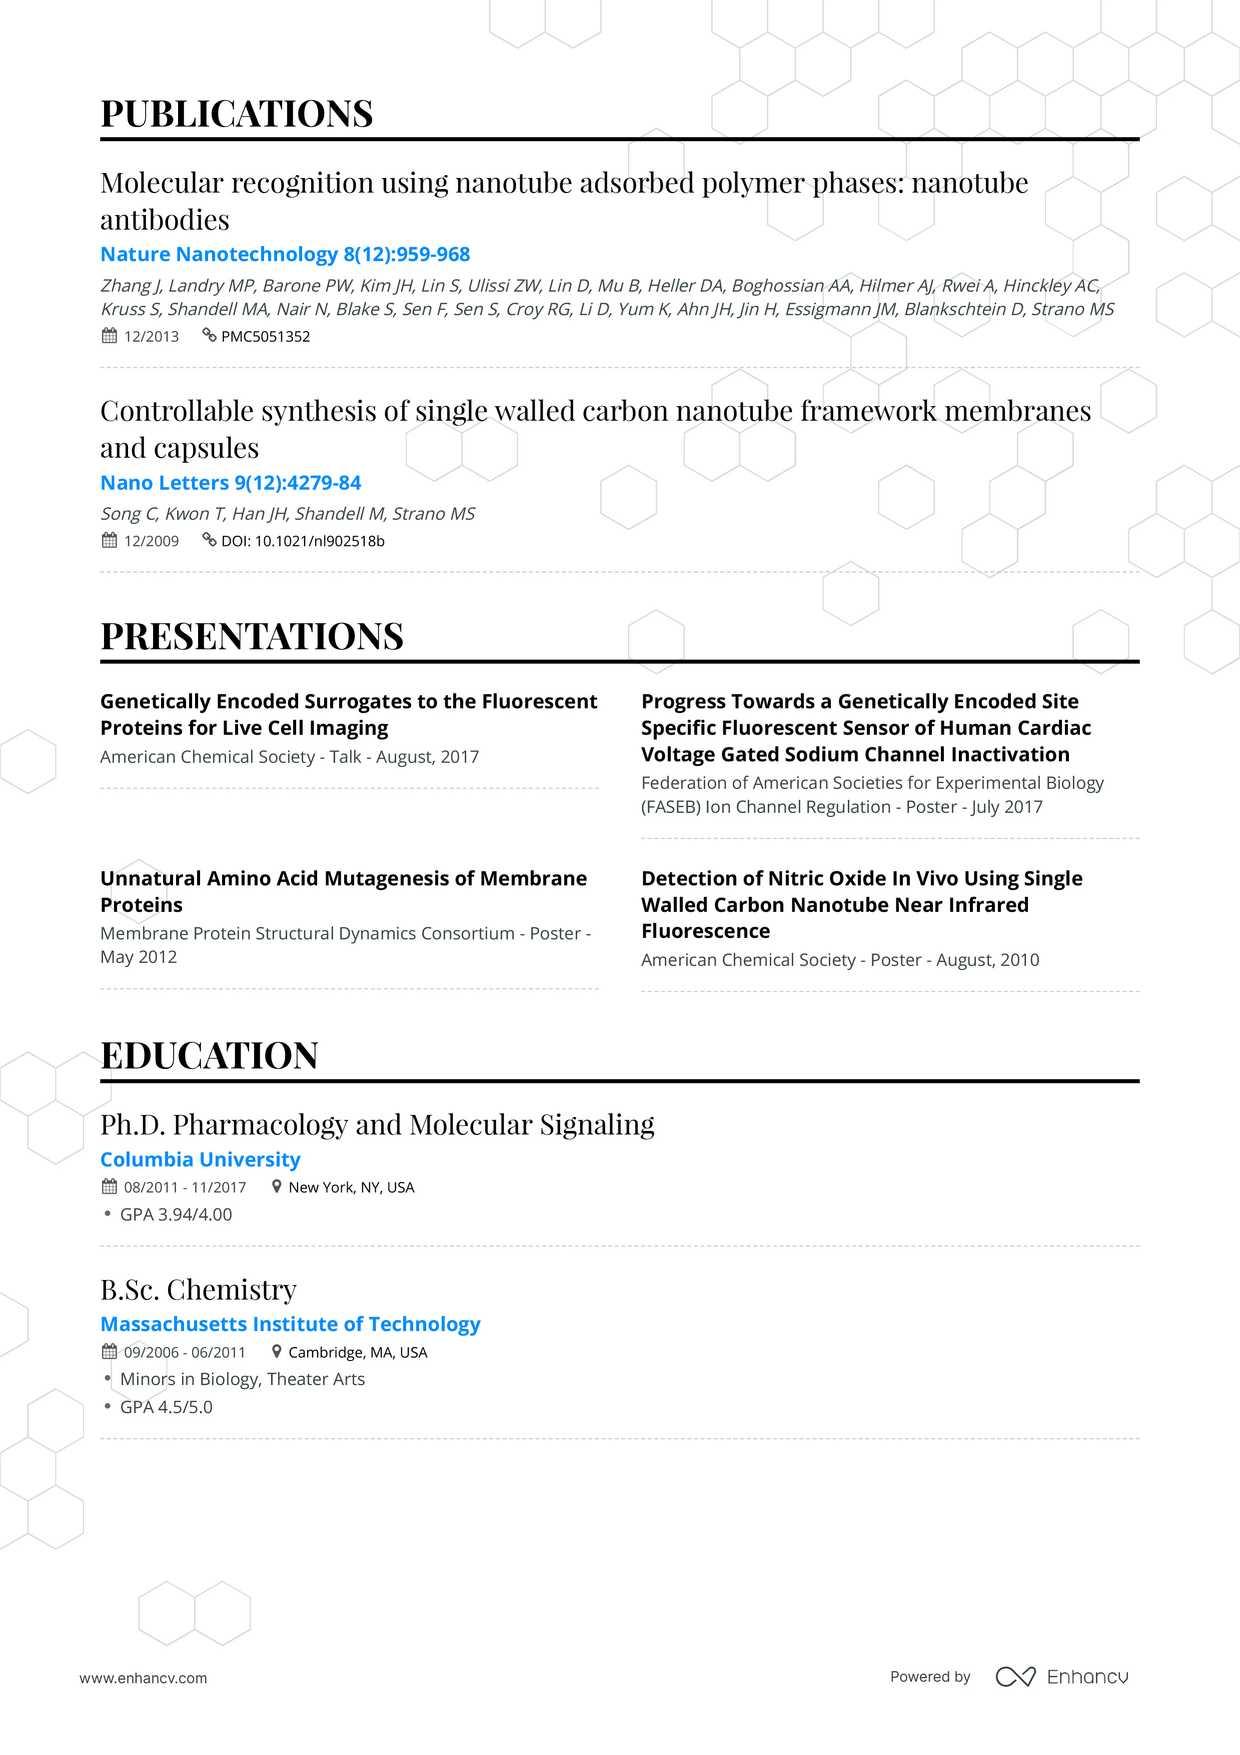 Professional CV & Resume Builder Pricing | Enhancv